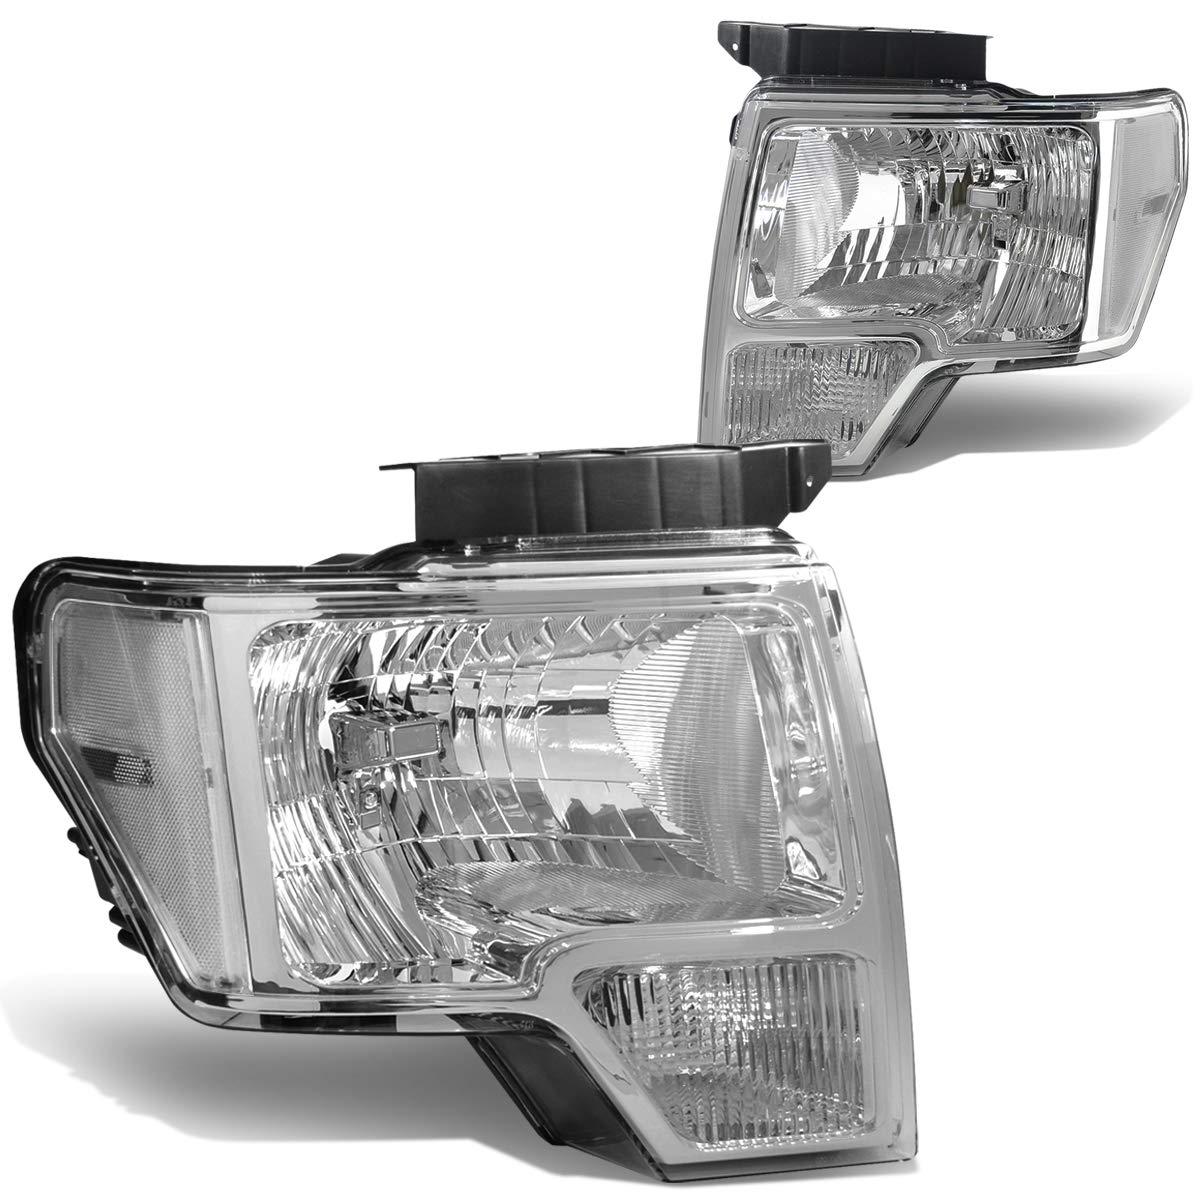 KAC Headlight Assembly for 2009-2014 F150 Truck Chrome Halogen Headlight Black Housing Amber Reflector Clear Lens Driver and Passenger Side